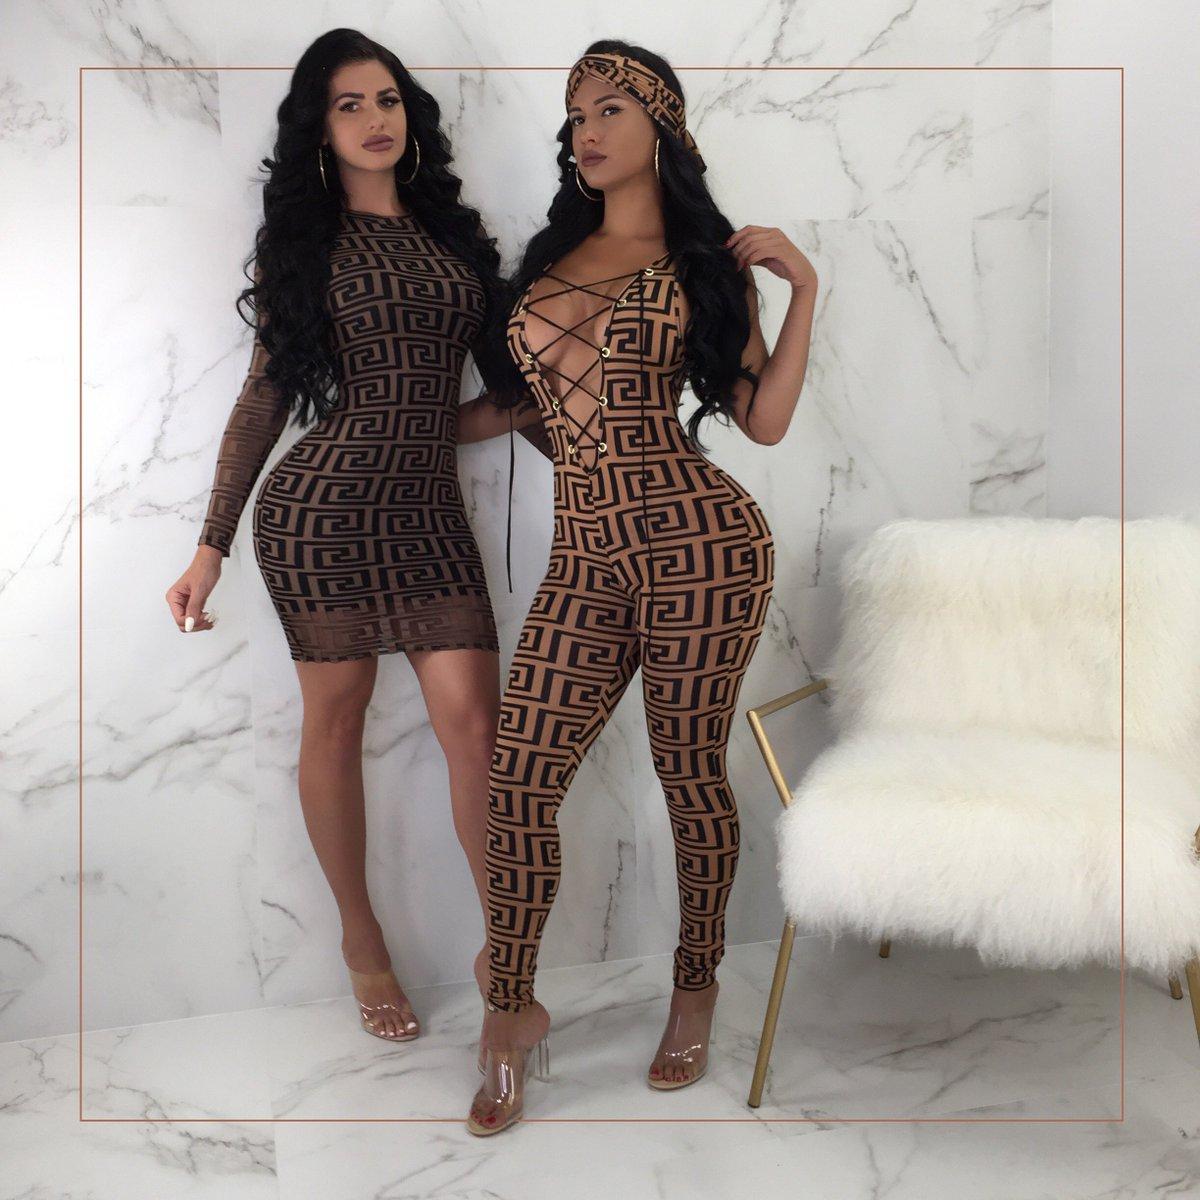 f9c24abce3 Diva Boutique Online ( divamodafashion)